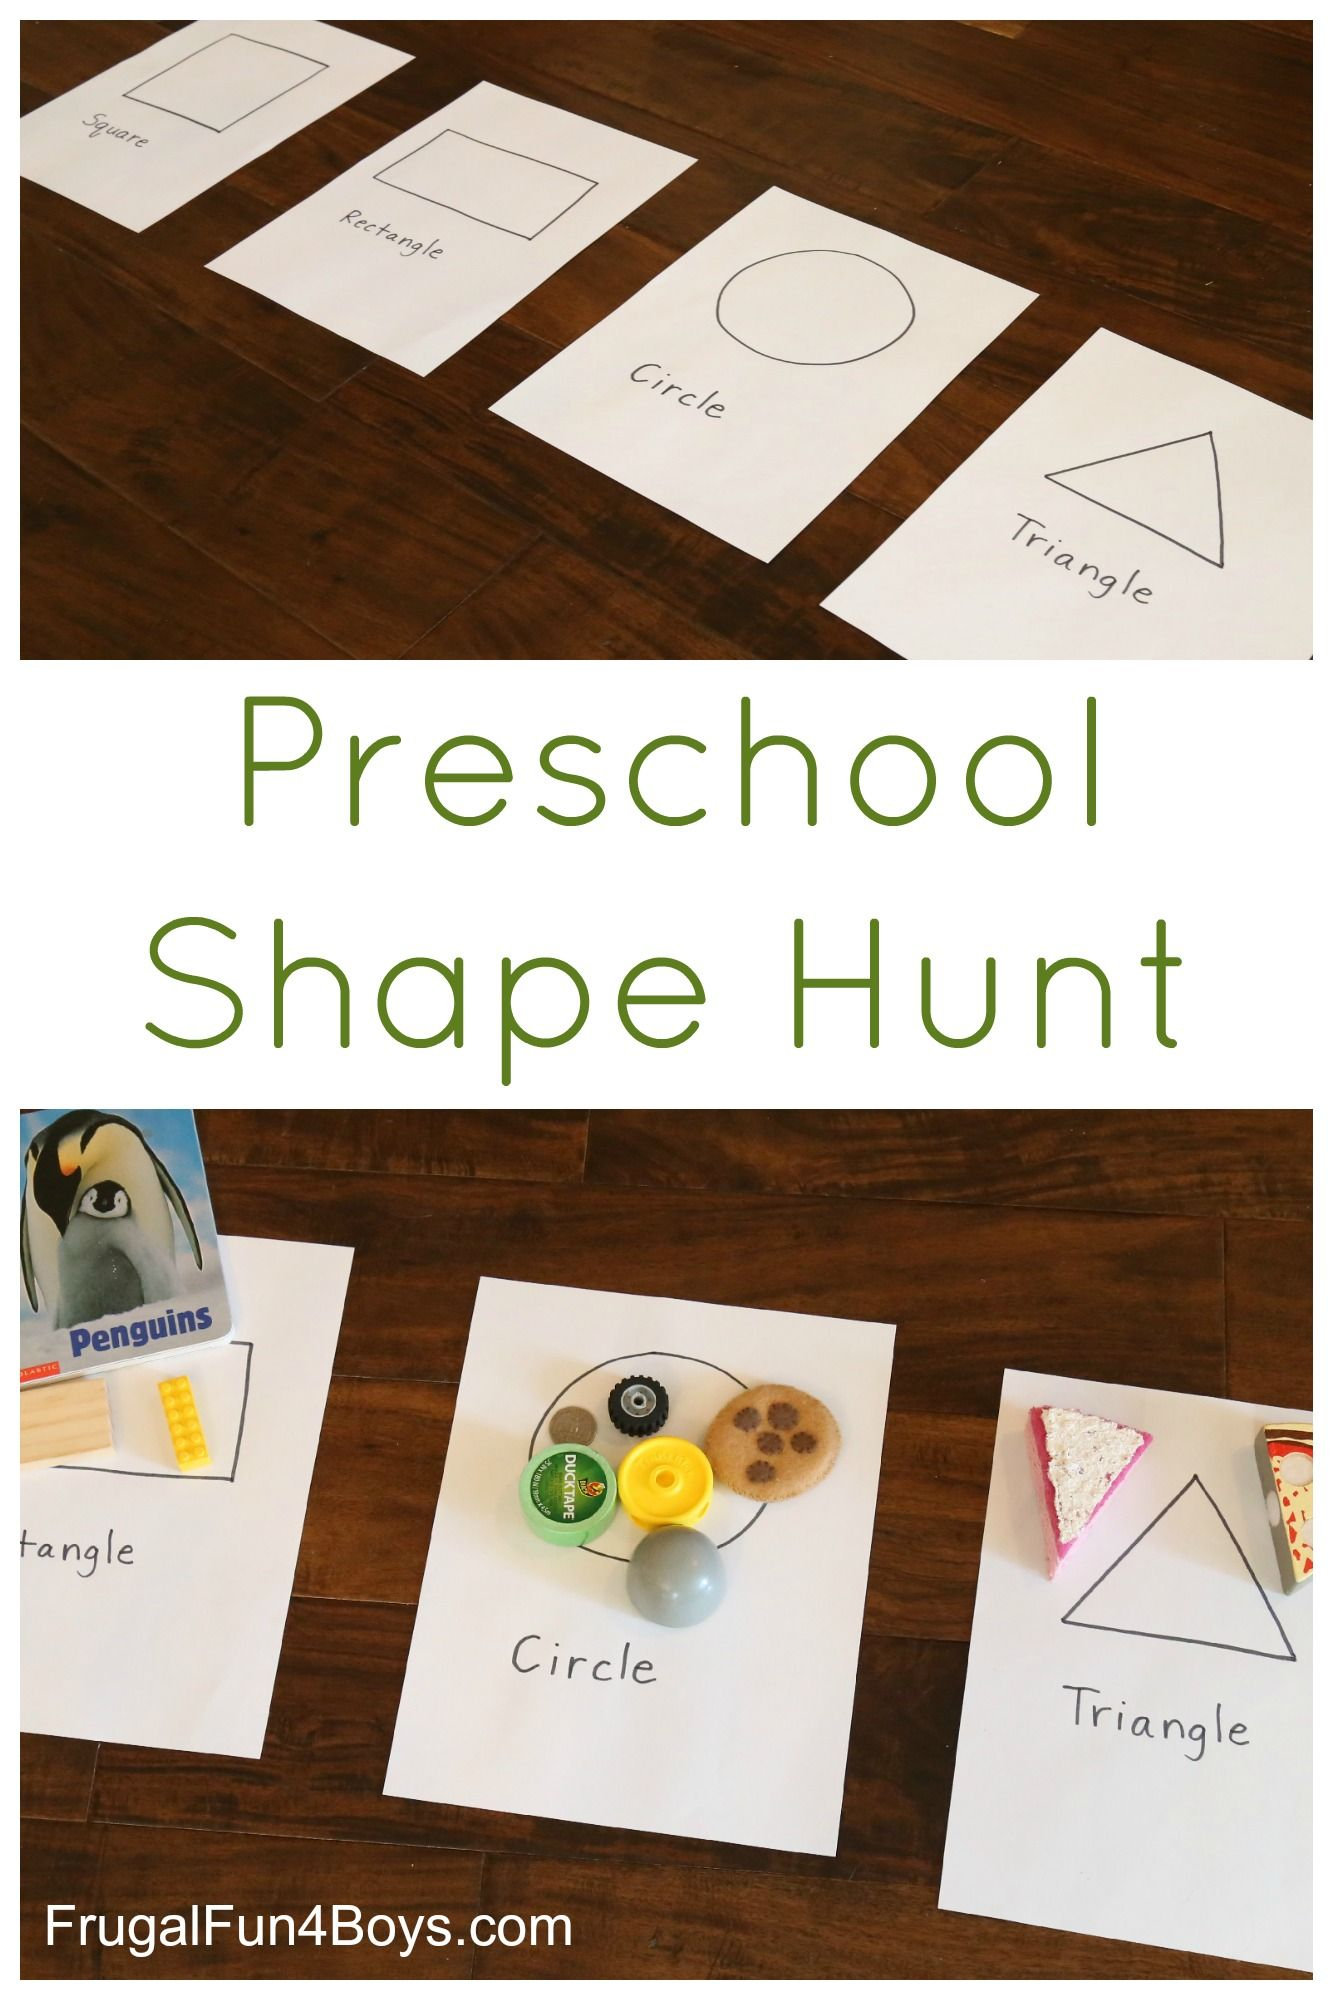 Preschool Shape Scavenger Hunt Preschool shapes, Simple